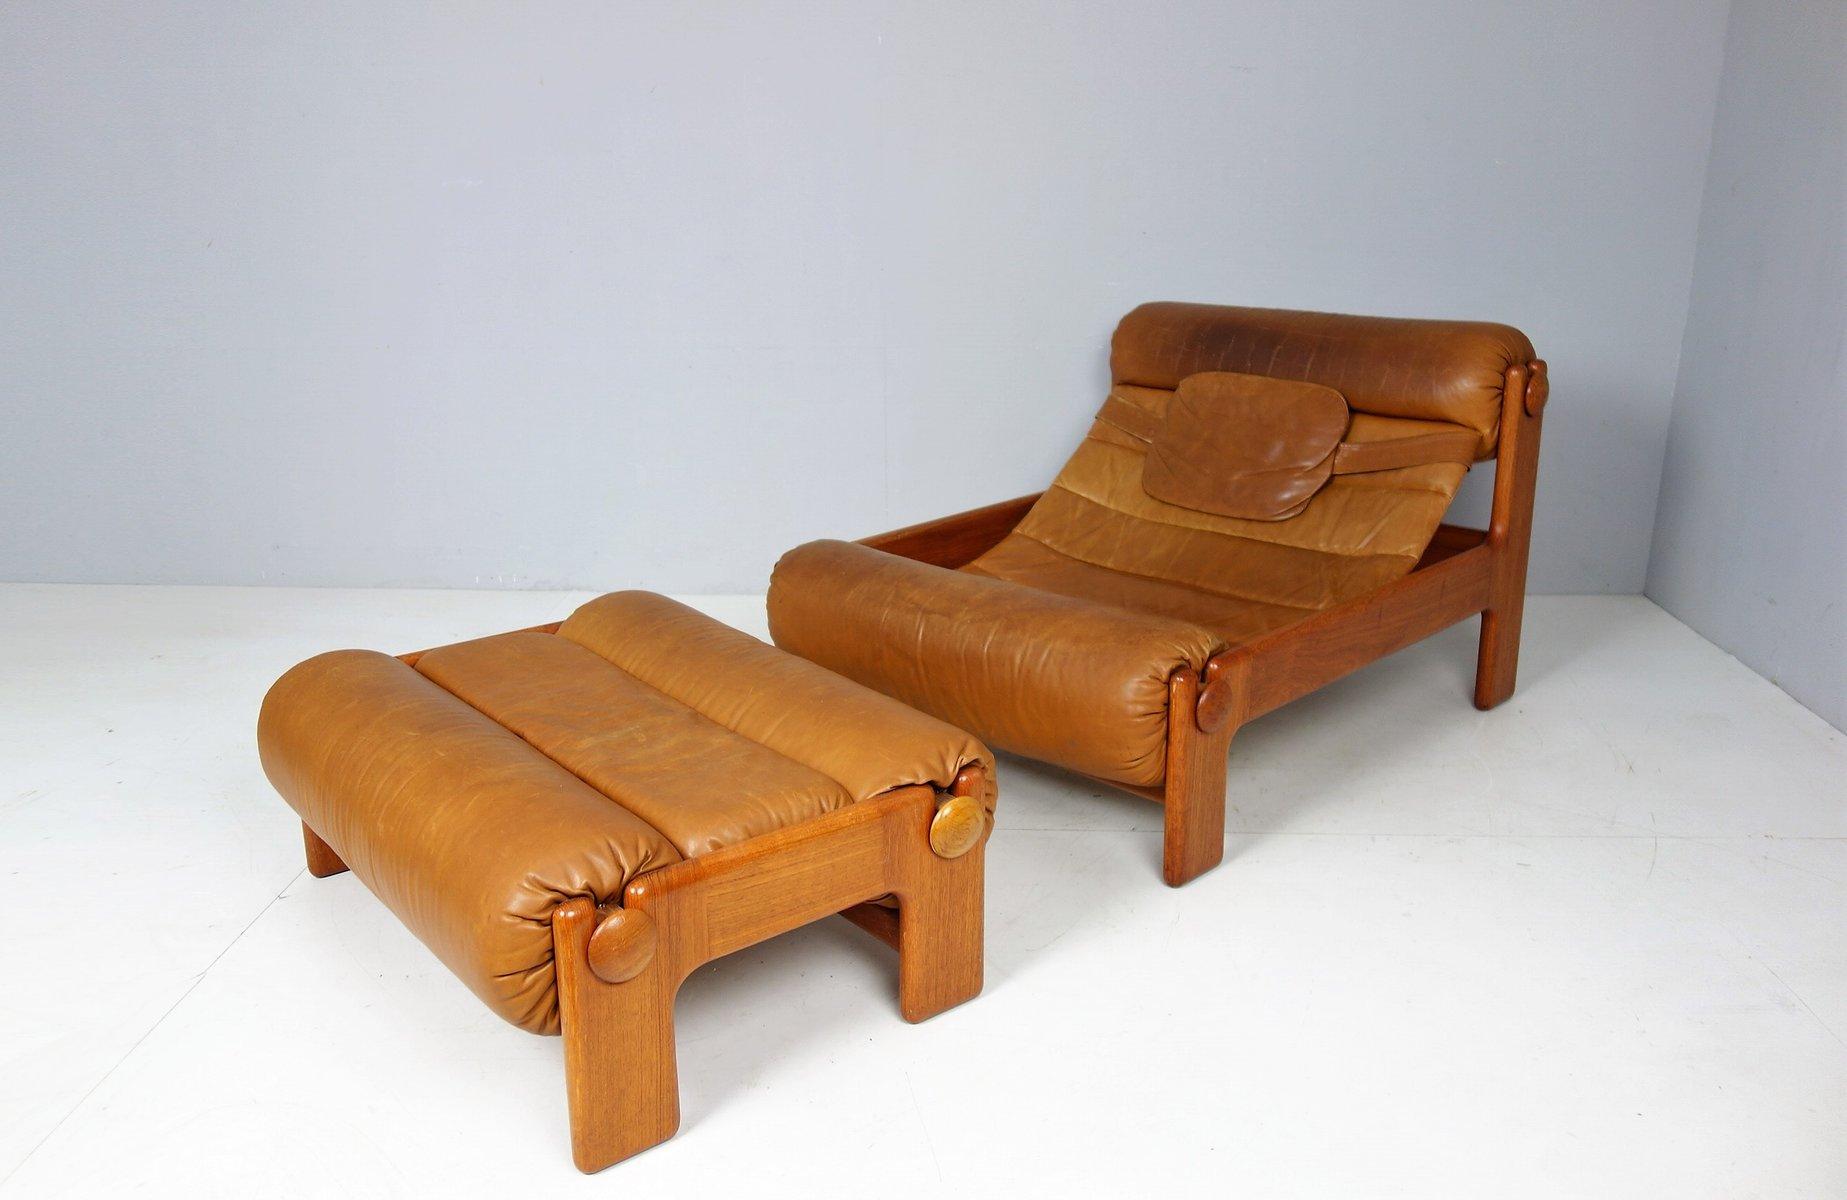 Vintage Swedish Lounge Chair U0026 Ottoman, 1960s